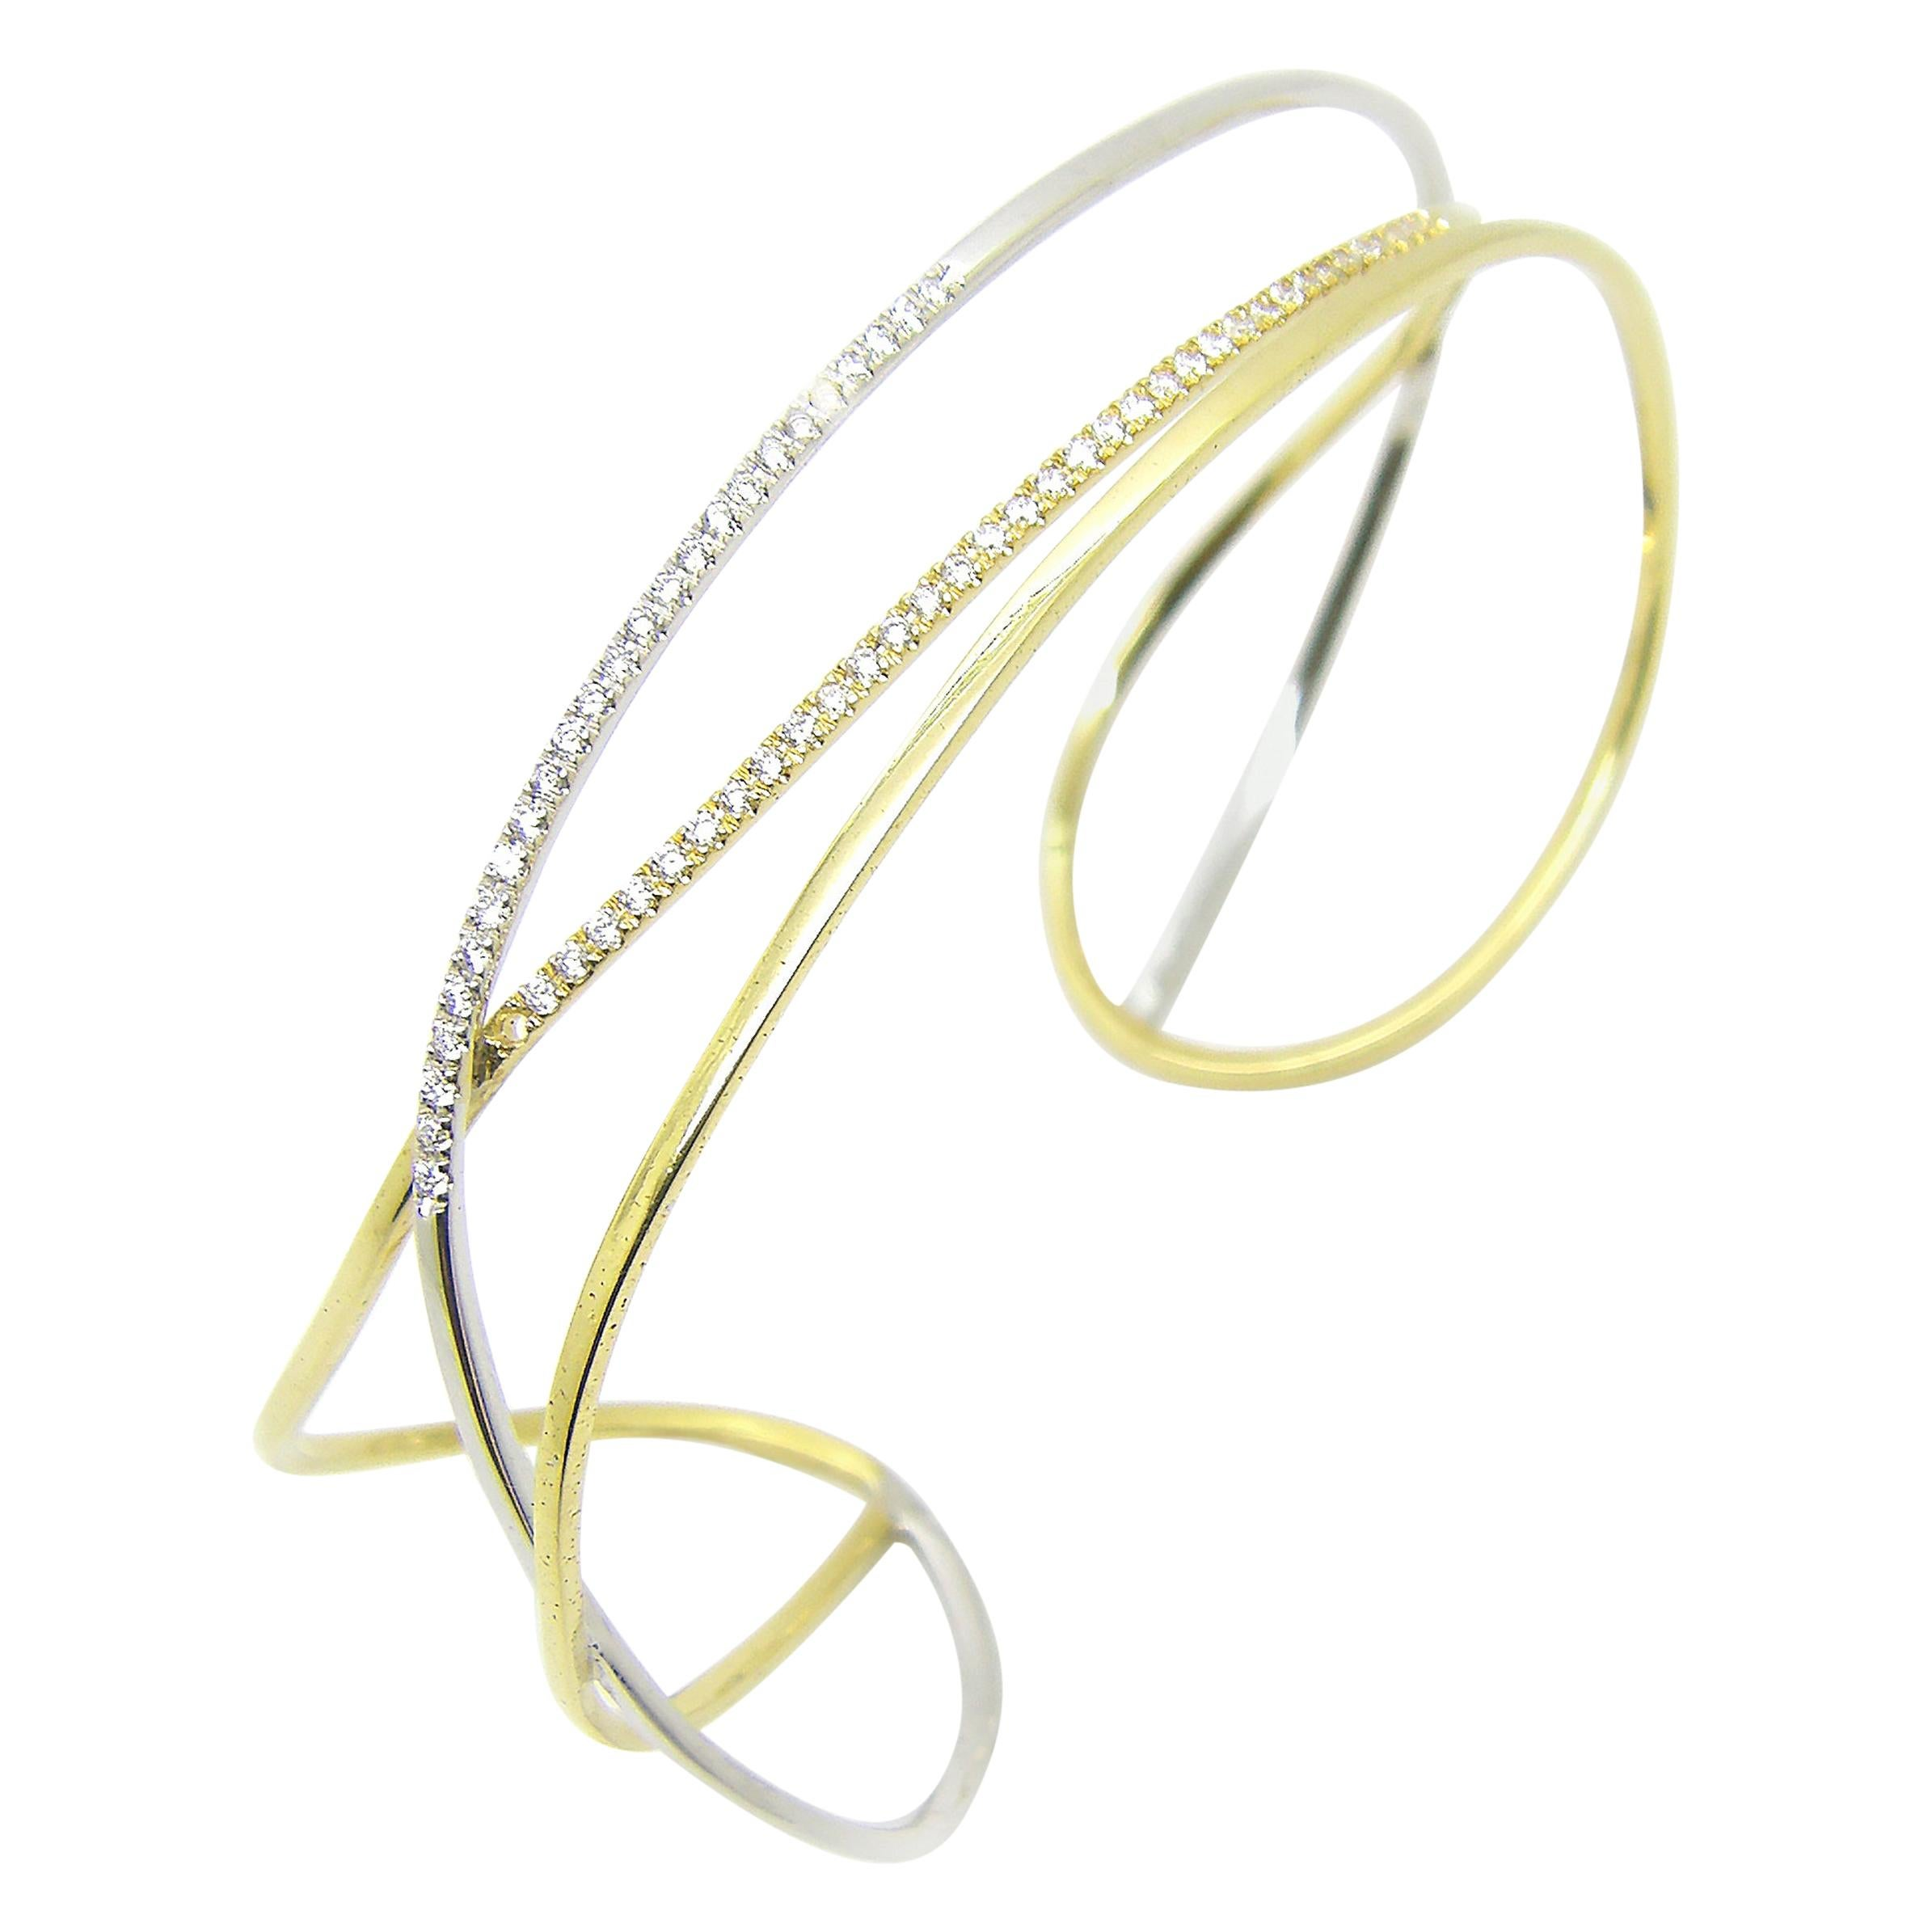 Georgios Collections 18 Karat White and Yellow Gold Diamond Cuff Bracelet